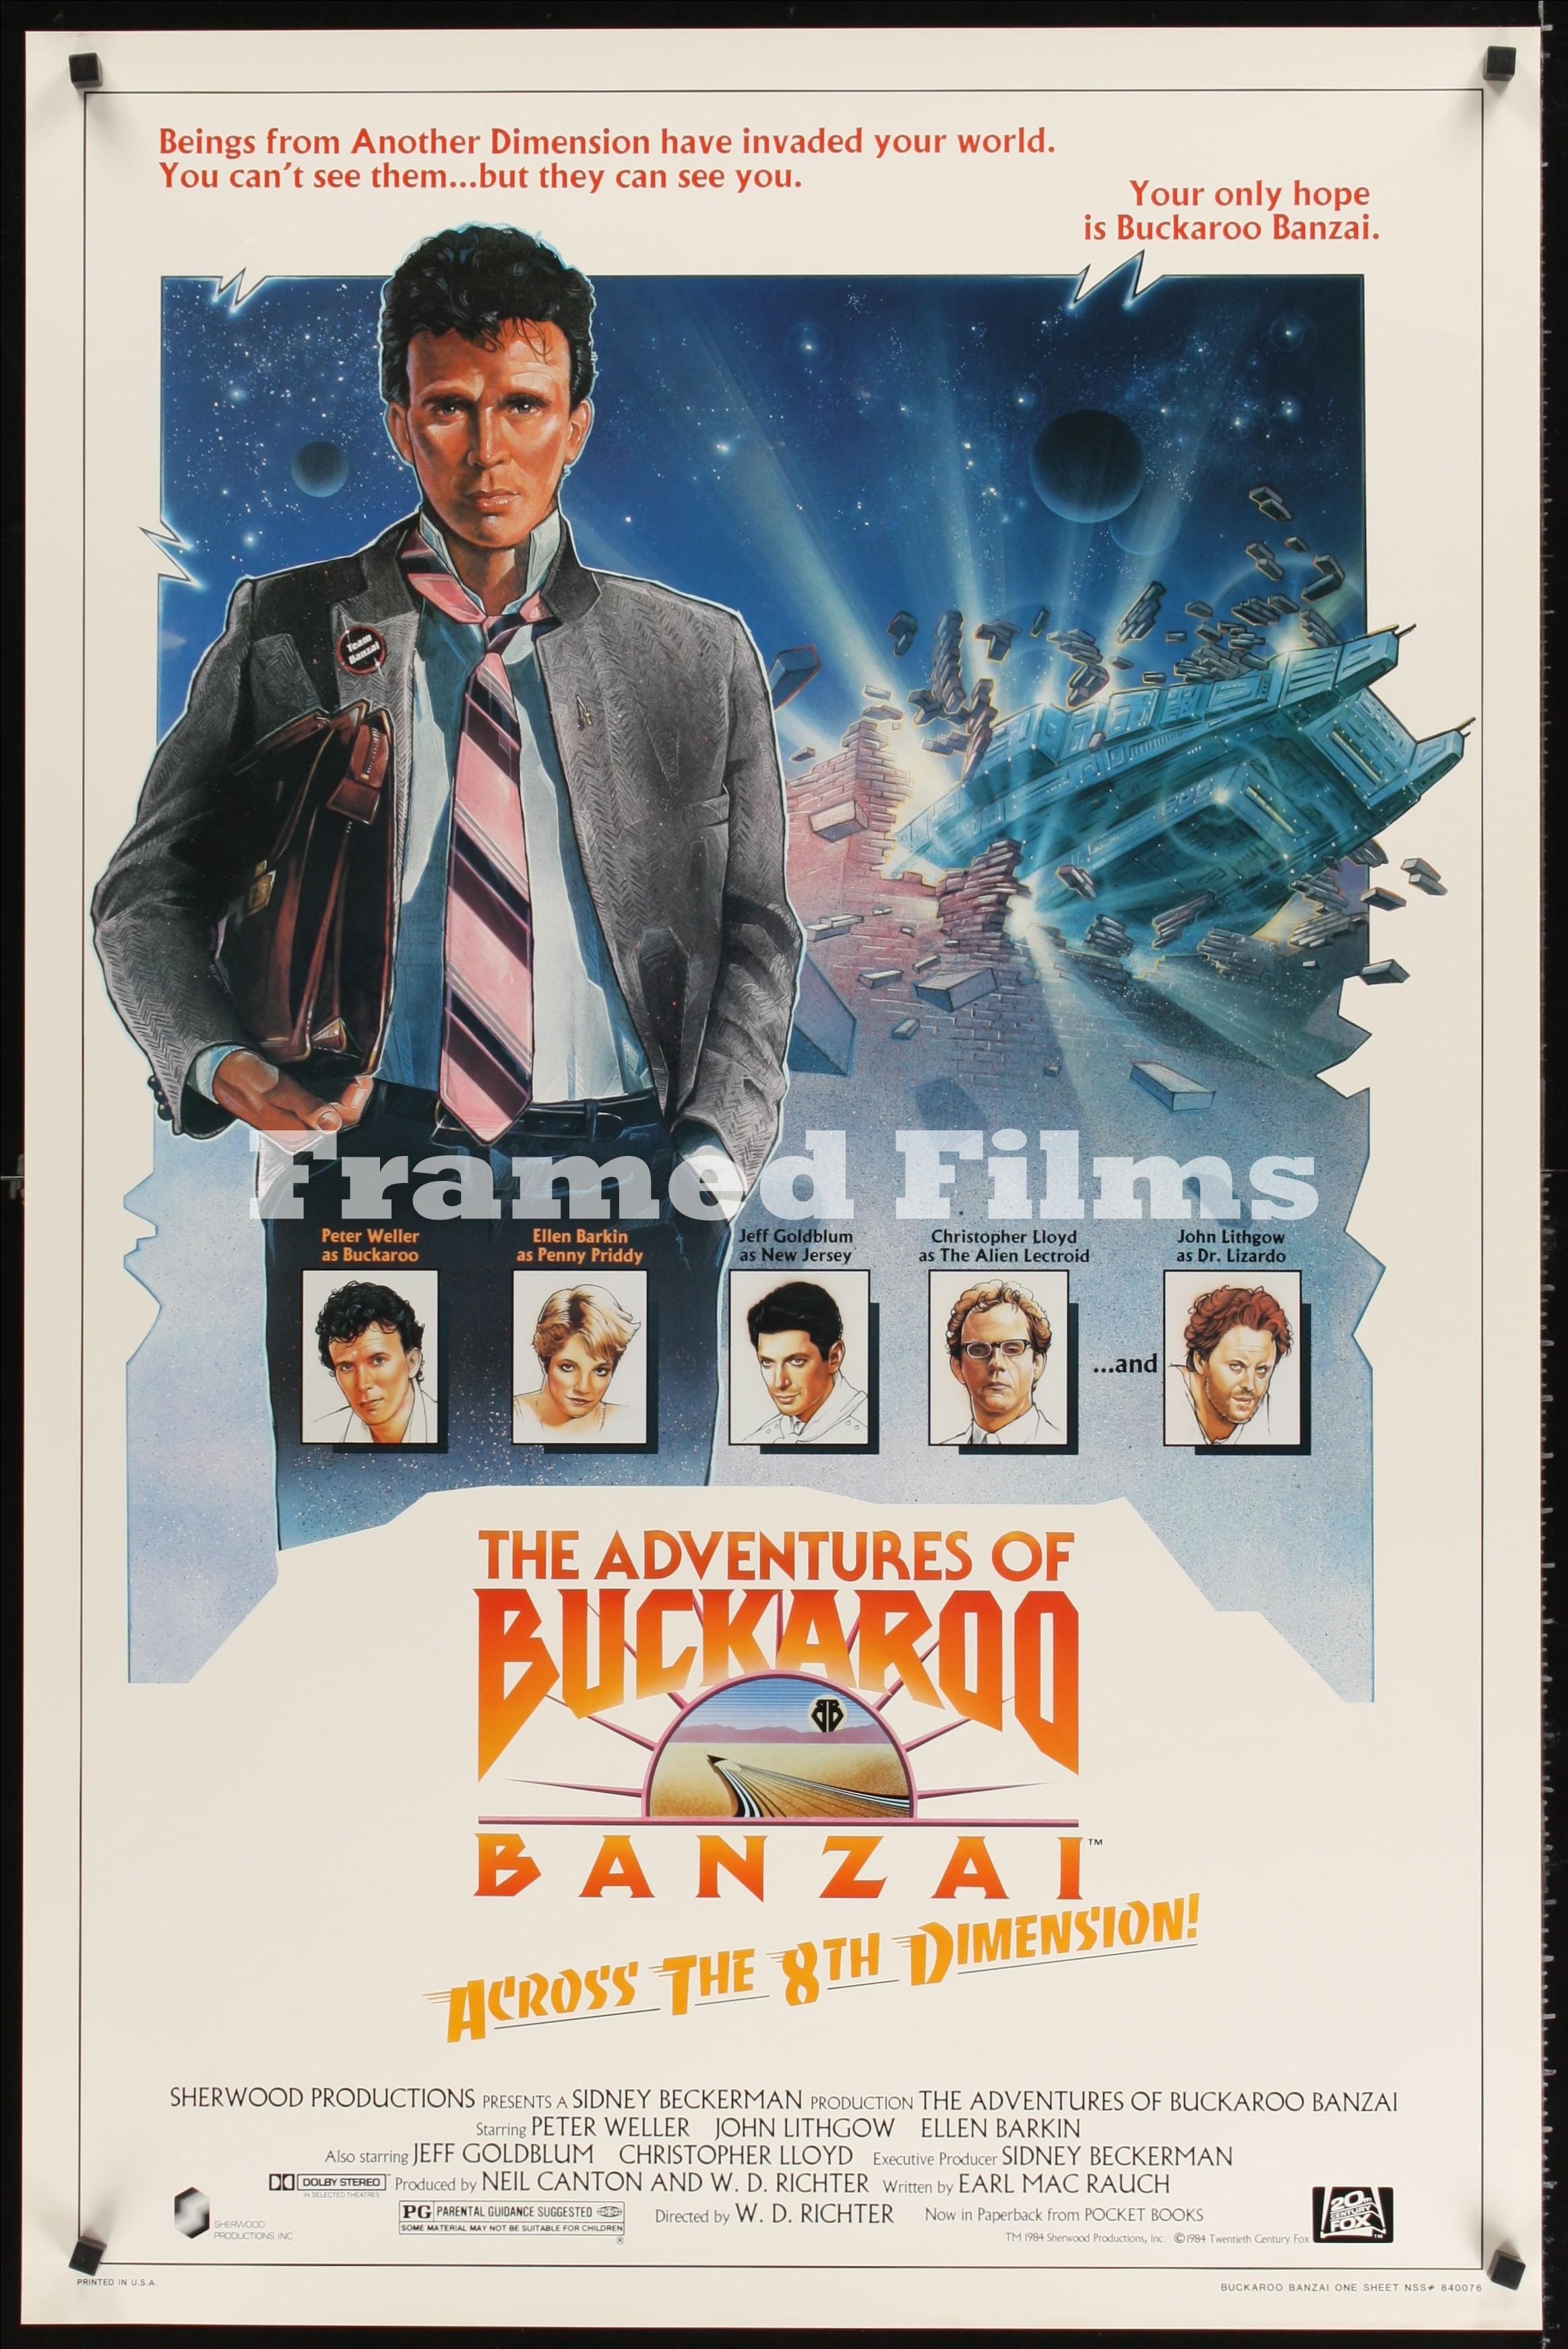 adventures_of_buckaroo_banzai_JC02164_L.jpg